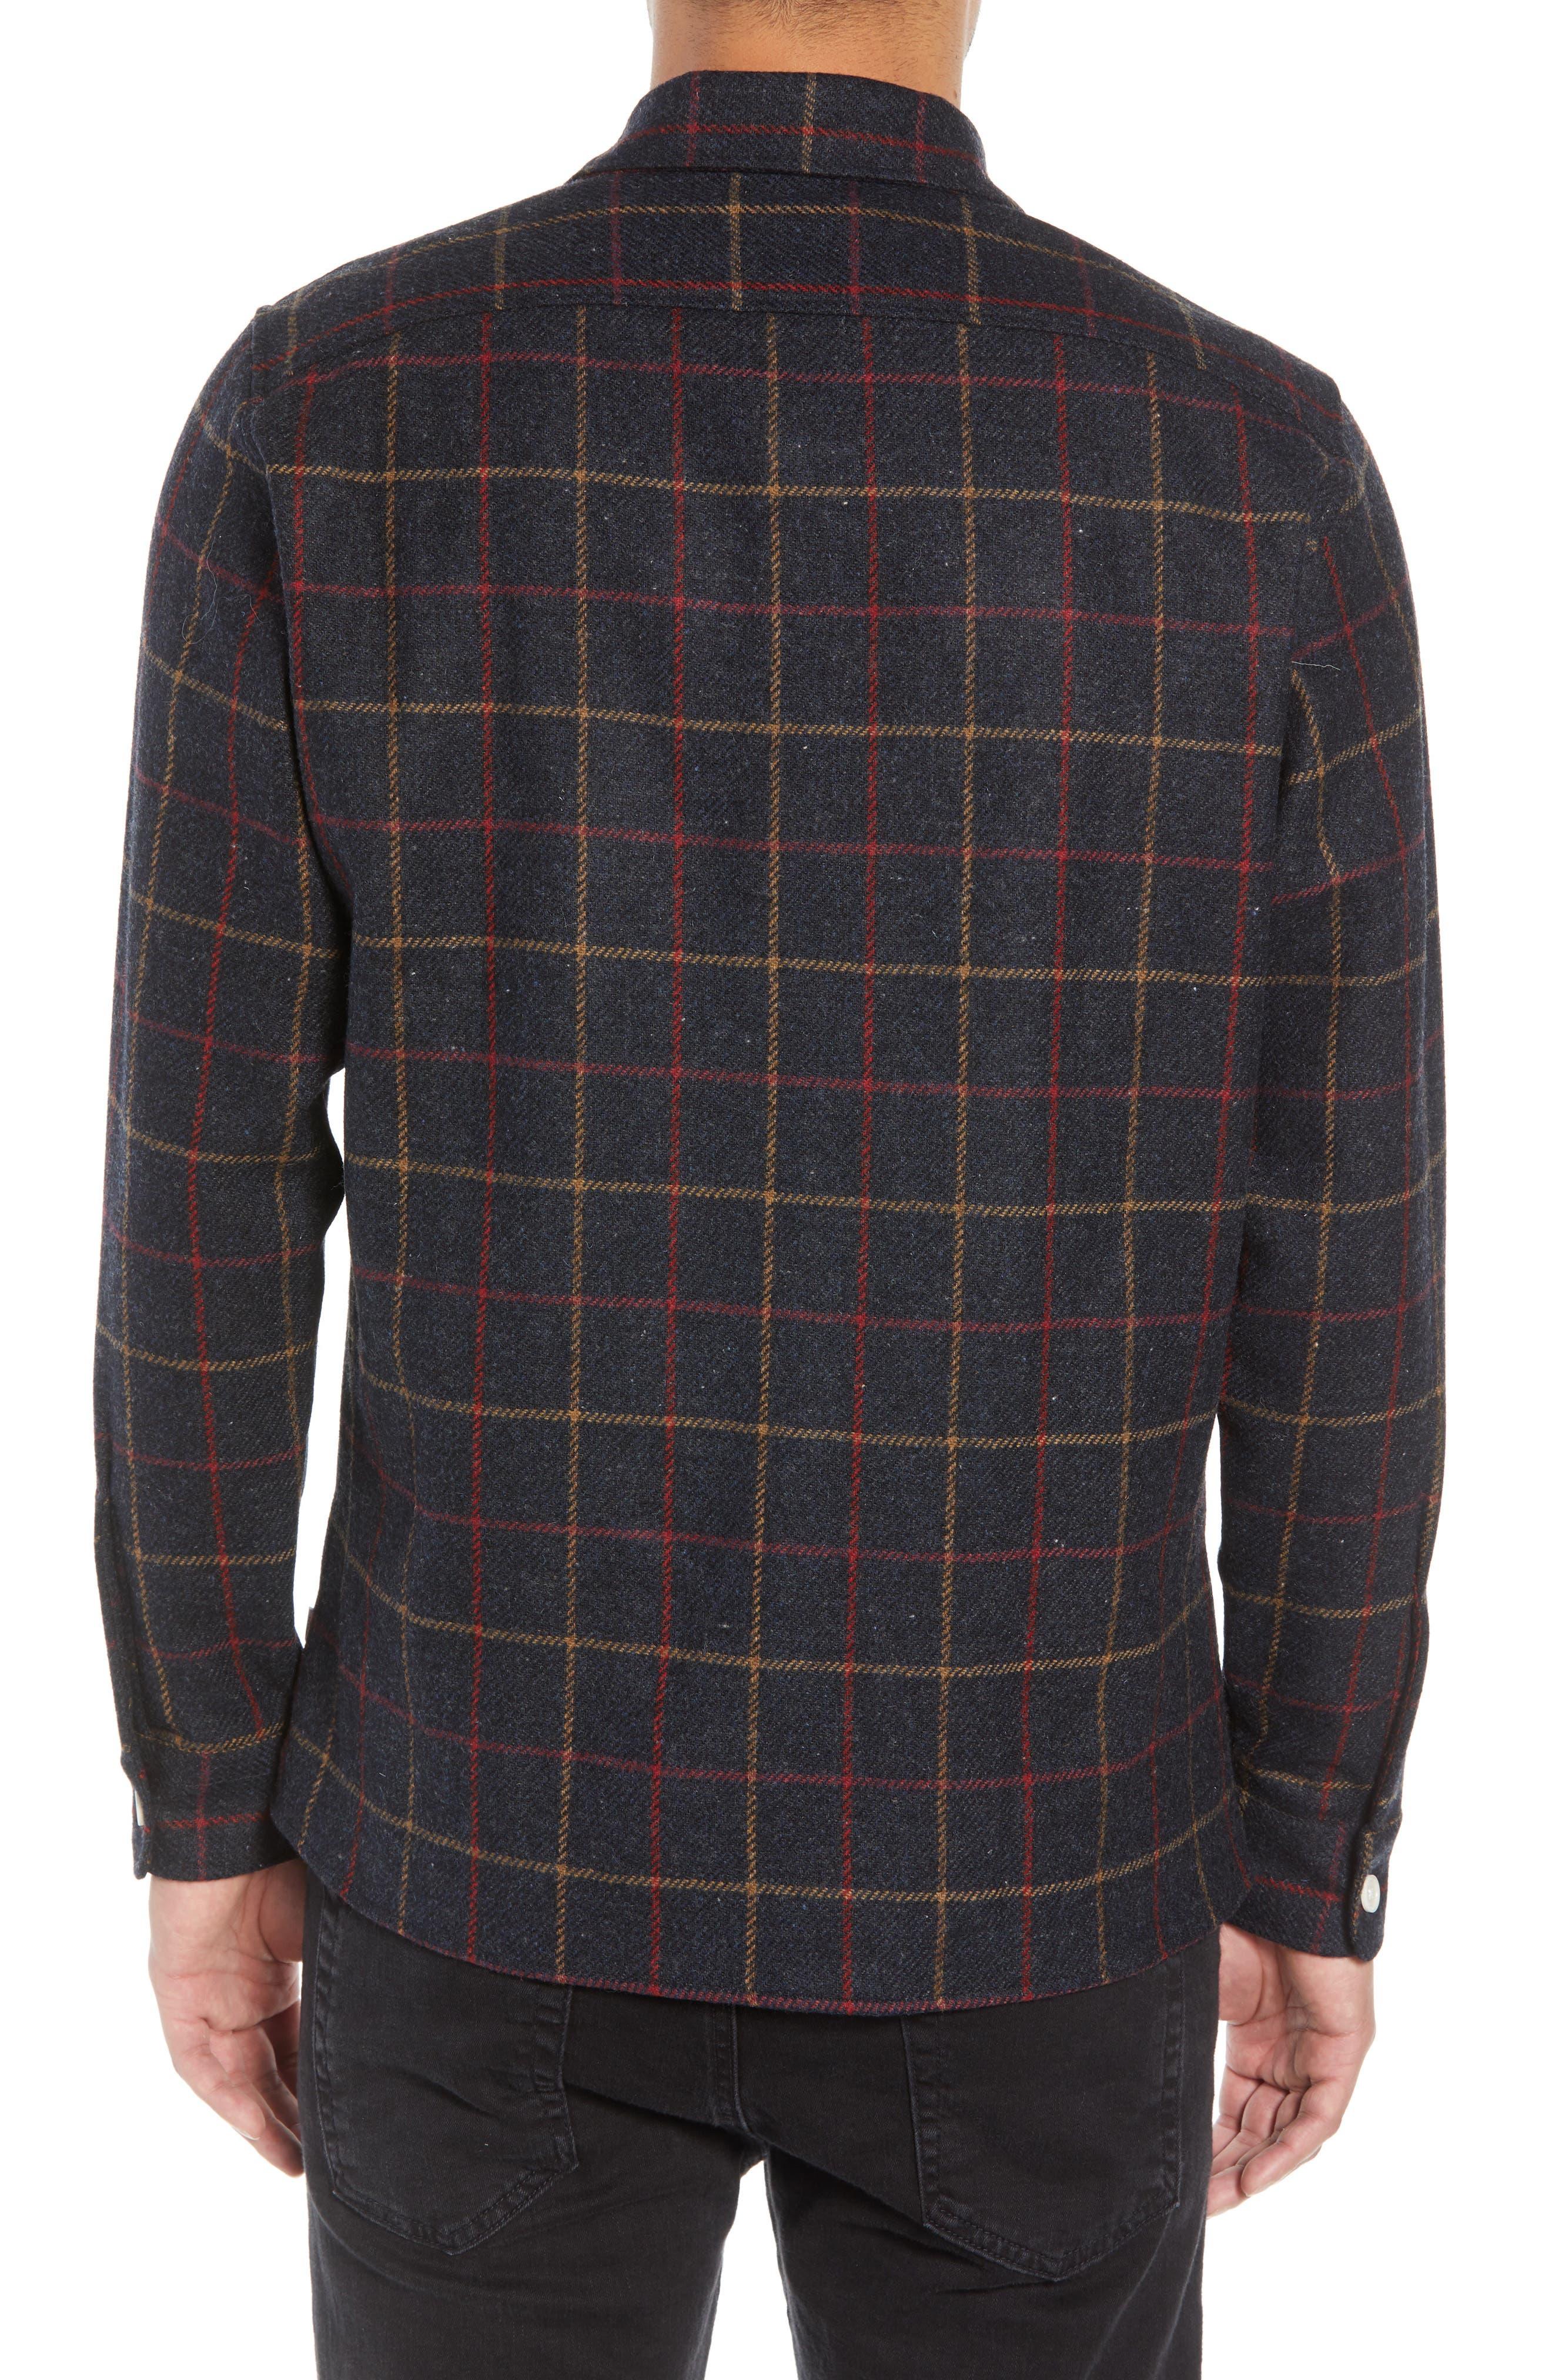 Whiting Tattersall Wool Shirt Jacket,                             Alternate thumbnail 3, color,                             BLACK WOOL CHECK